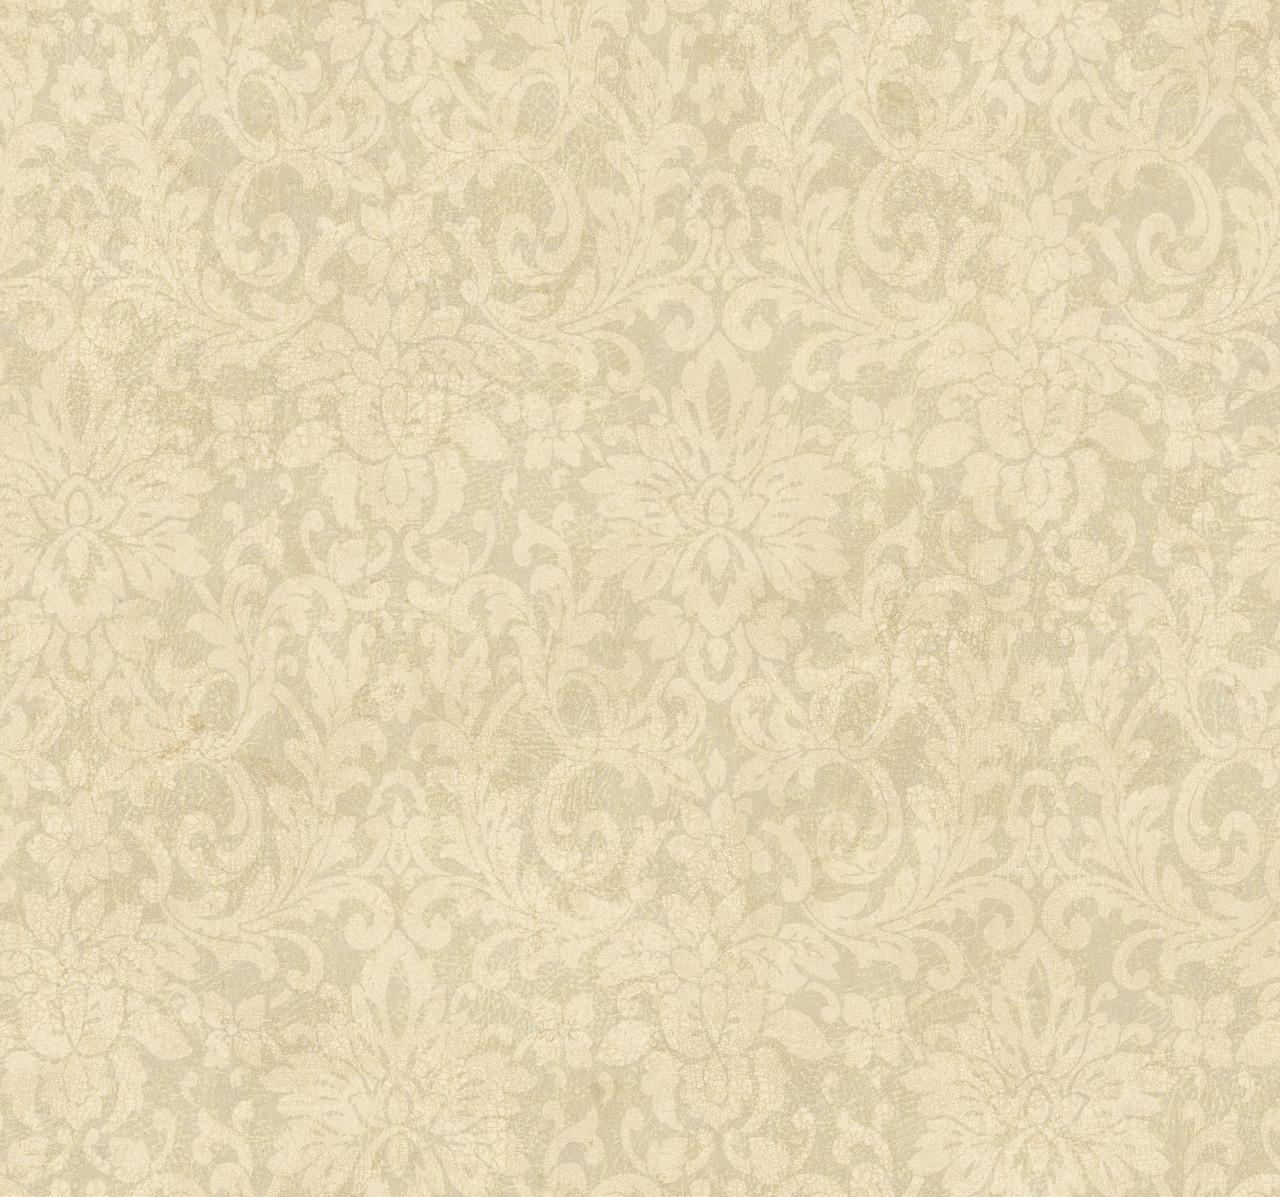 Handpainted Iii Hp0341 Floral Damask Wallpaper Indoorwallpaper Com